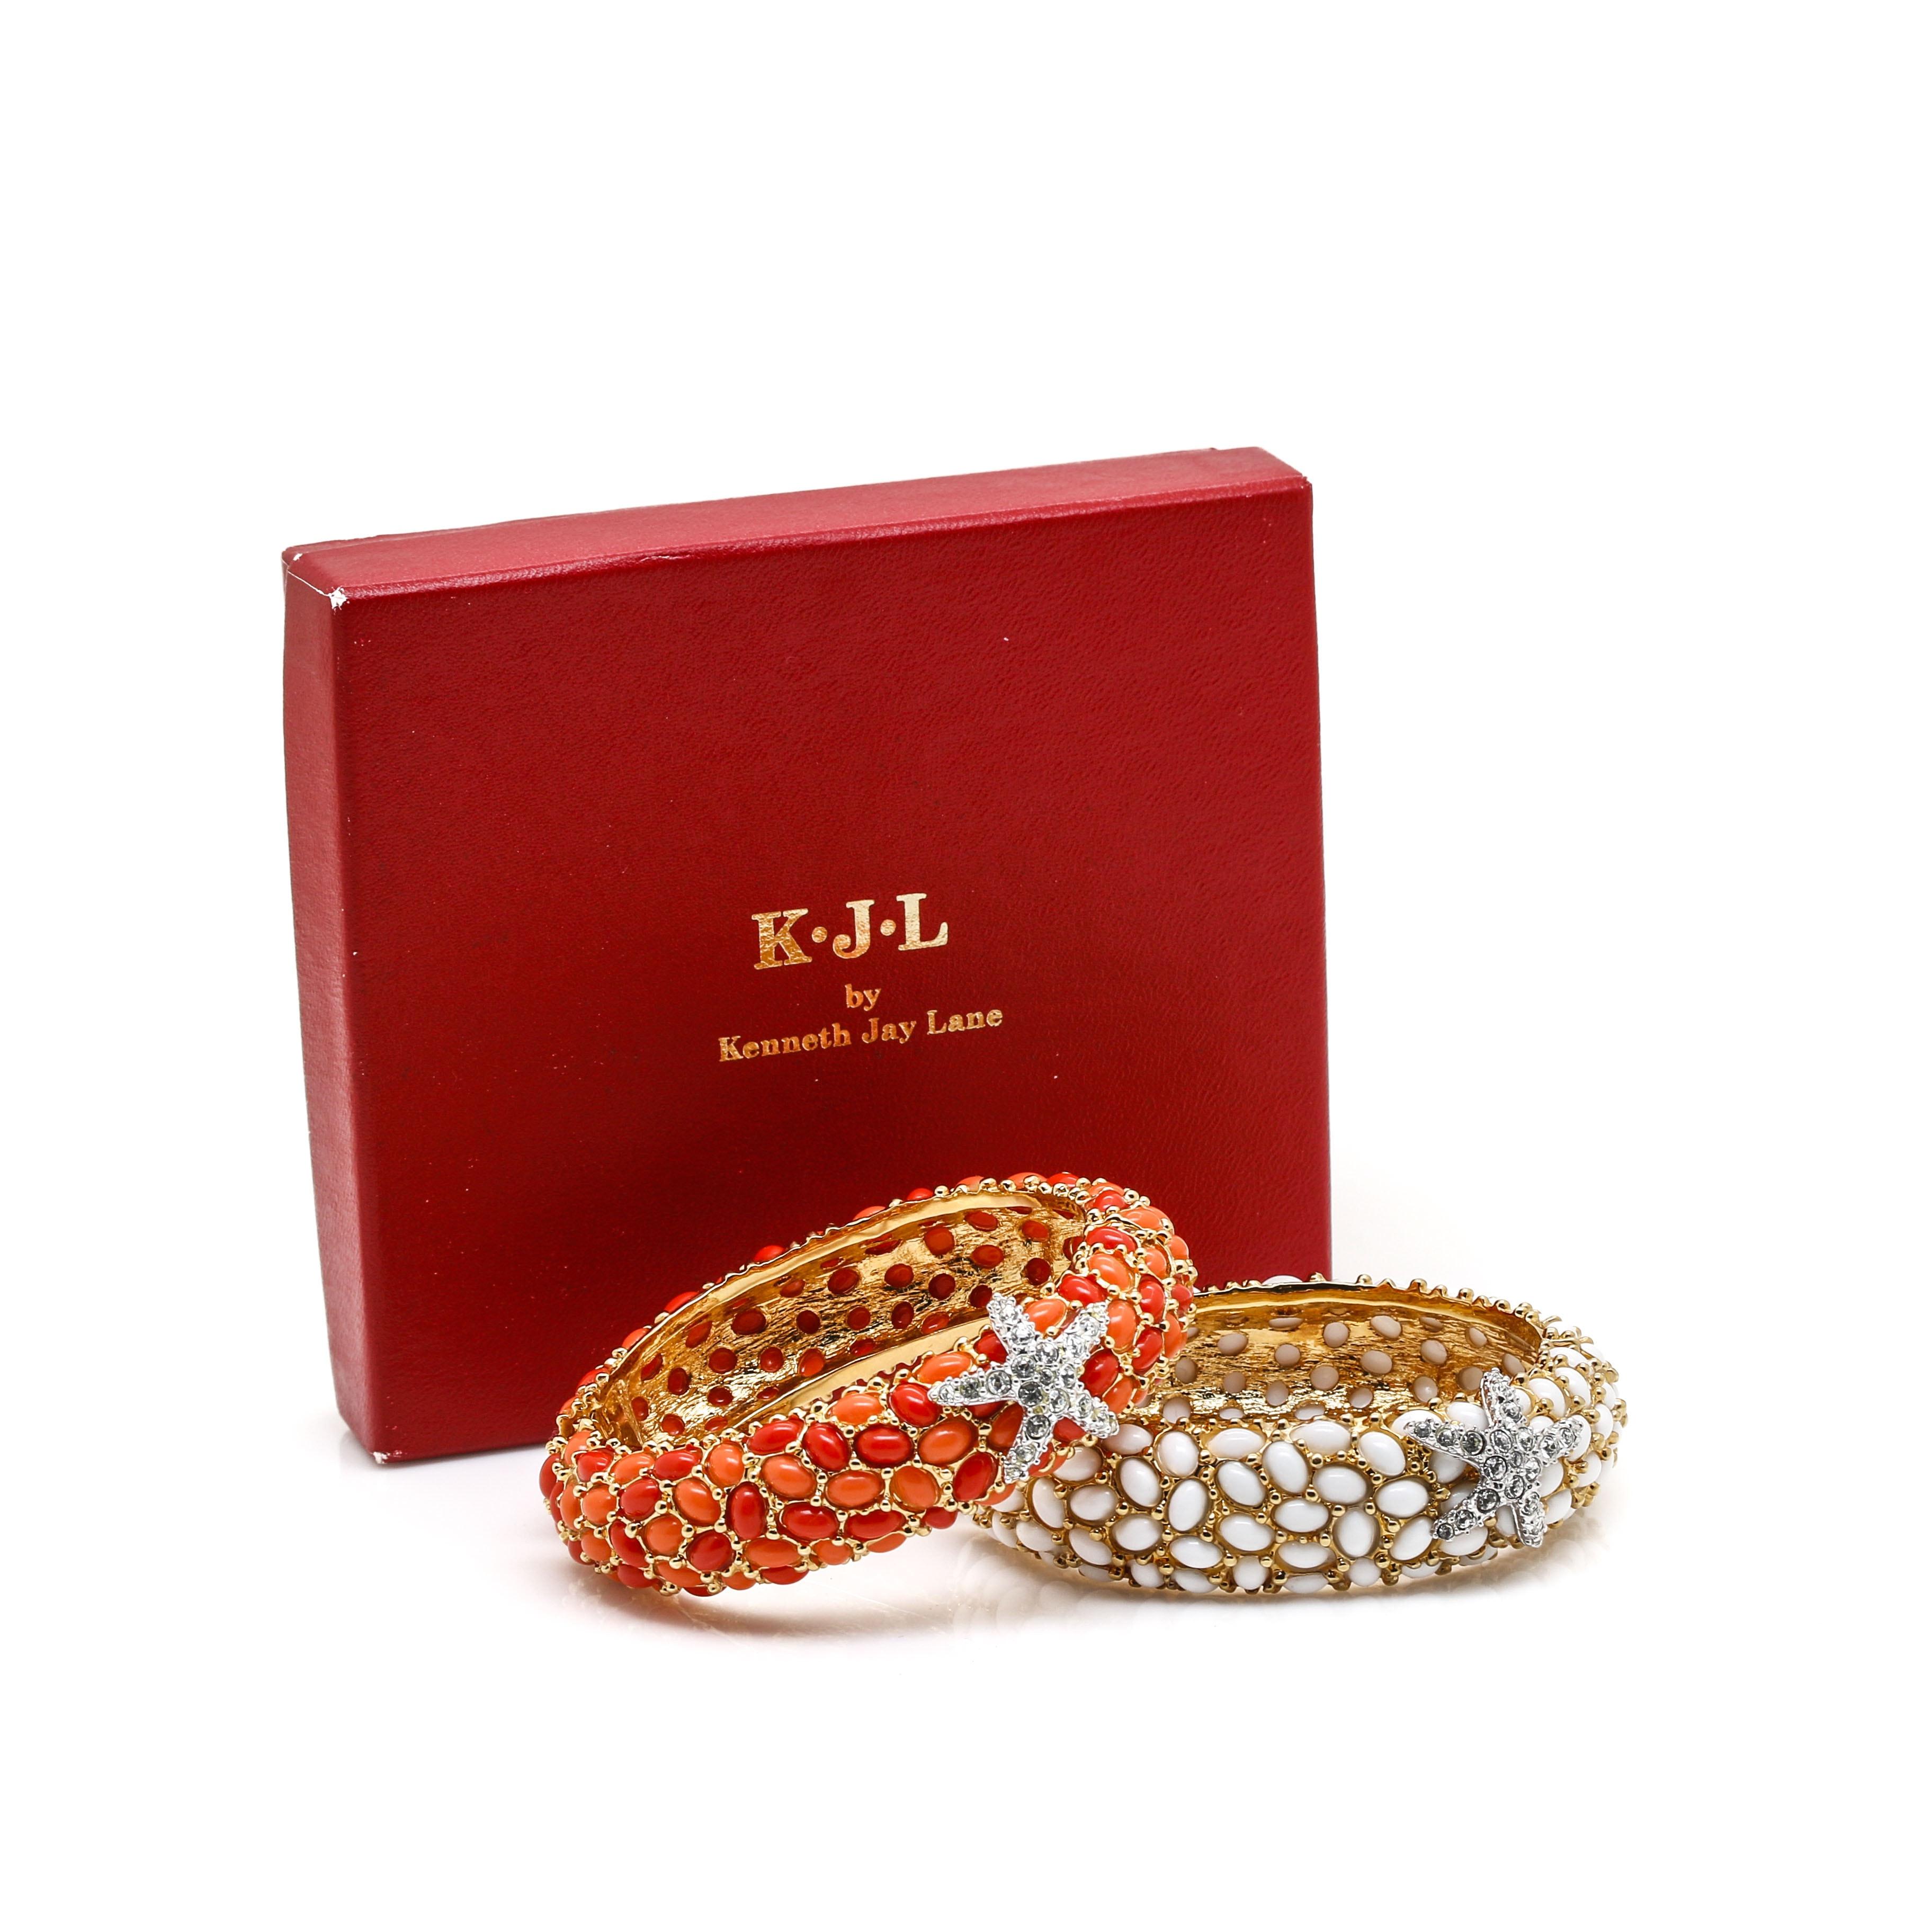 Kenneth Jay Lane Bangle Bracelets